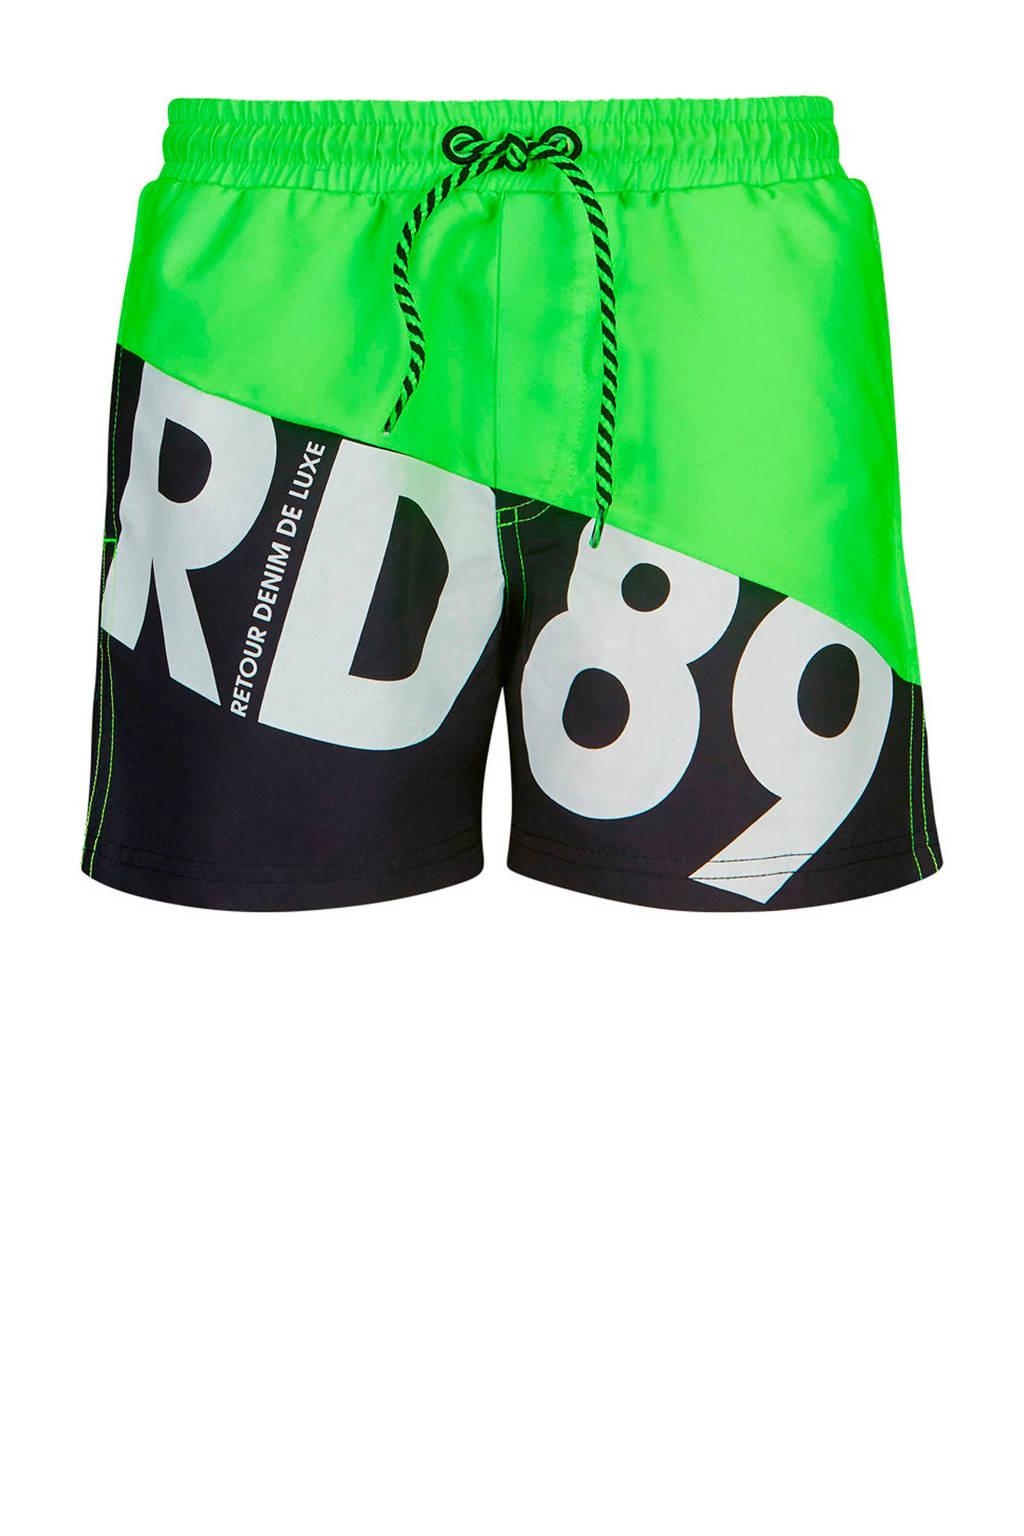 Retour Denim zwemshort Elmo neon groen/zwart